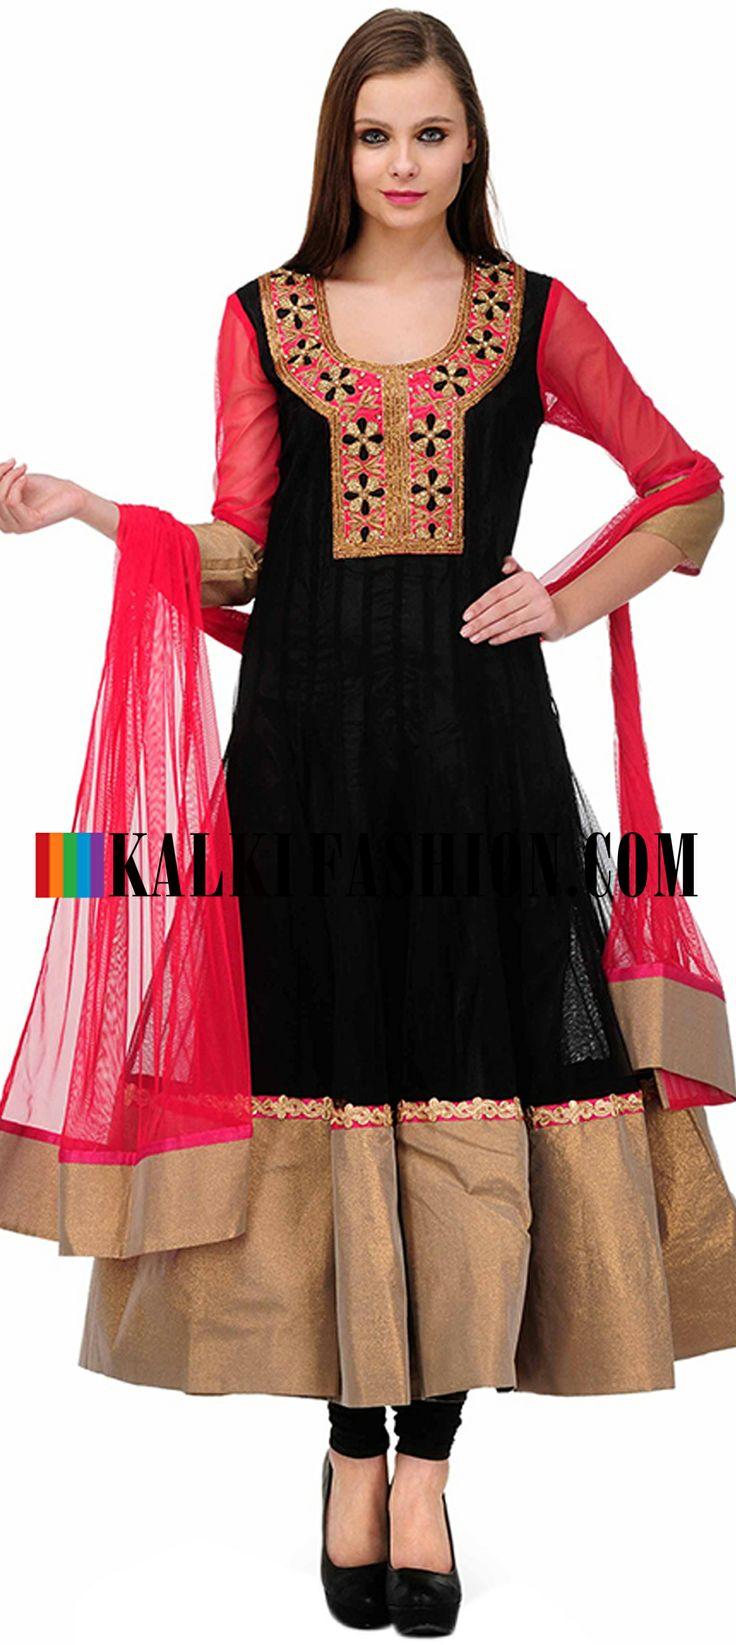 Buy Online from the link below. We ship worldwide (Free Shipping over US$100)  http://www.kalkifashion.com/black-embellished-anarkali-suit-set.html